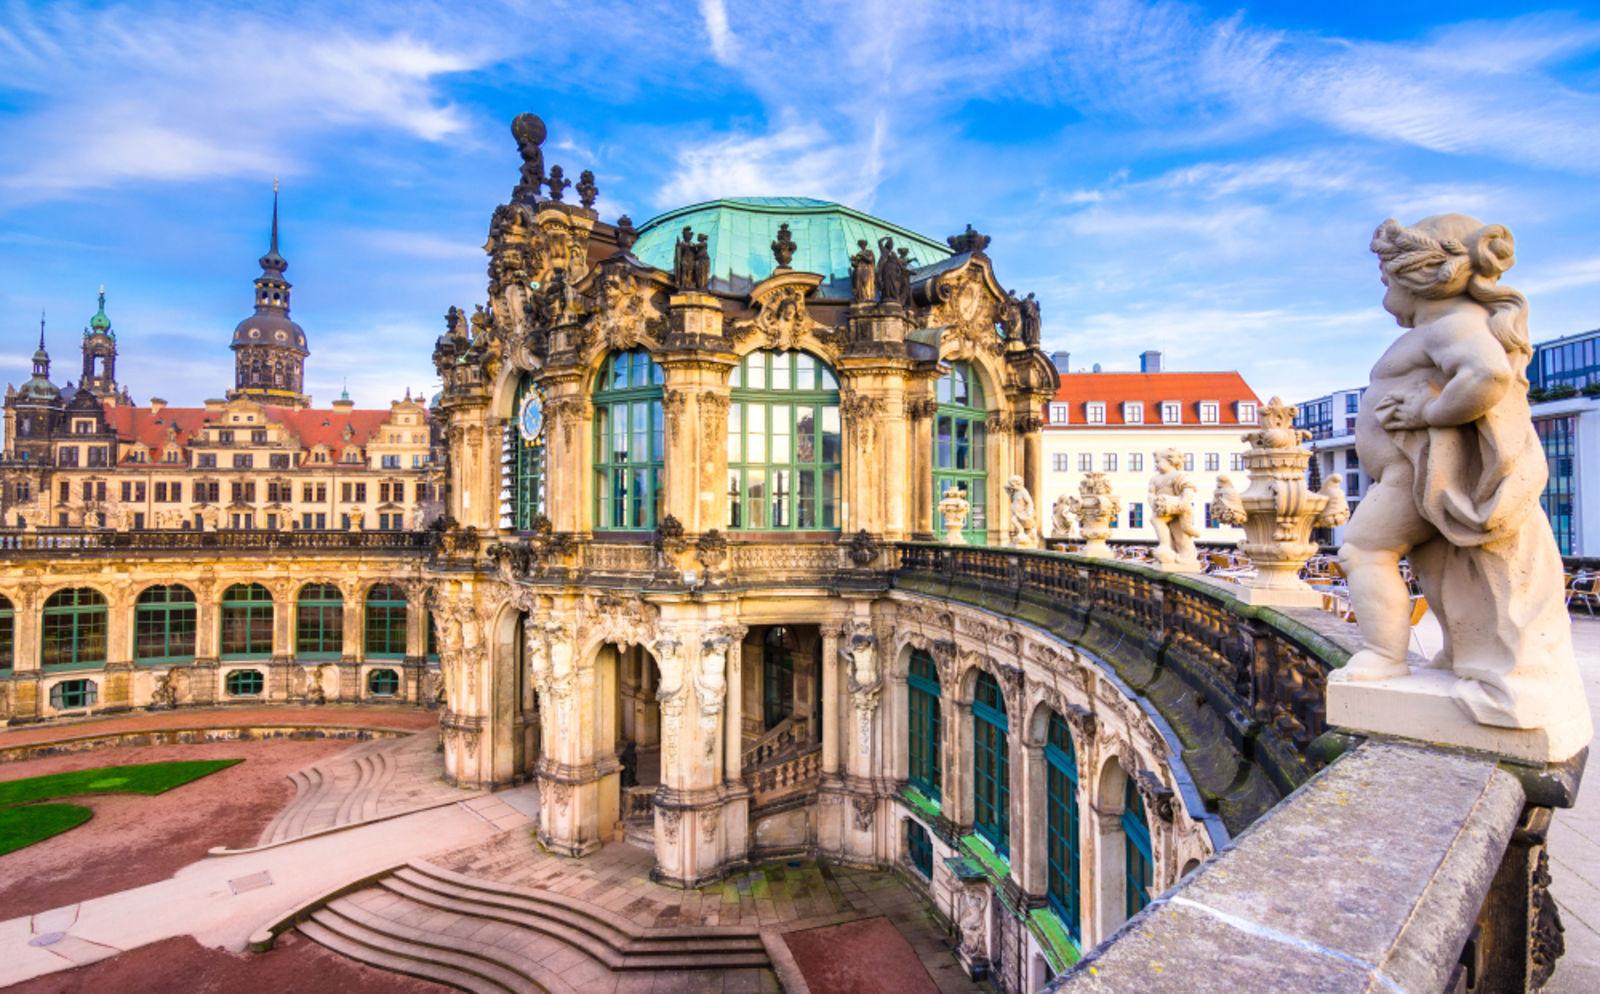 Zwinger Schloss in Dresden